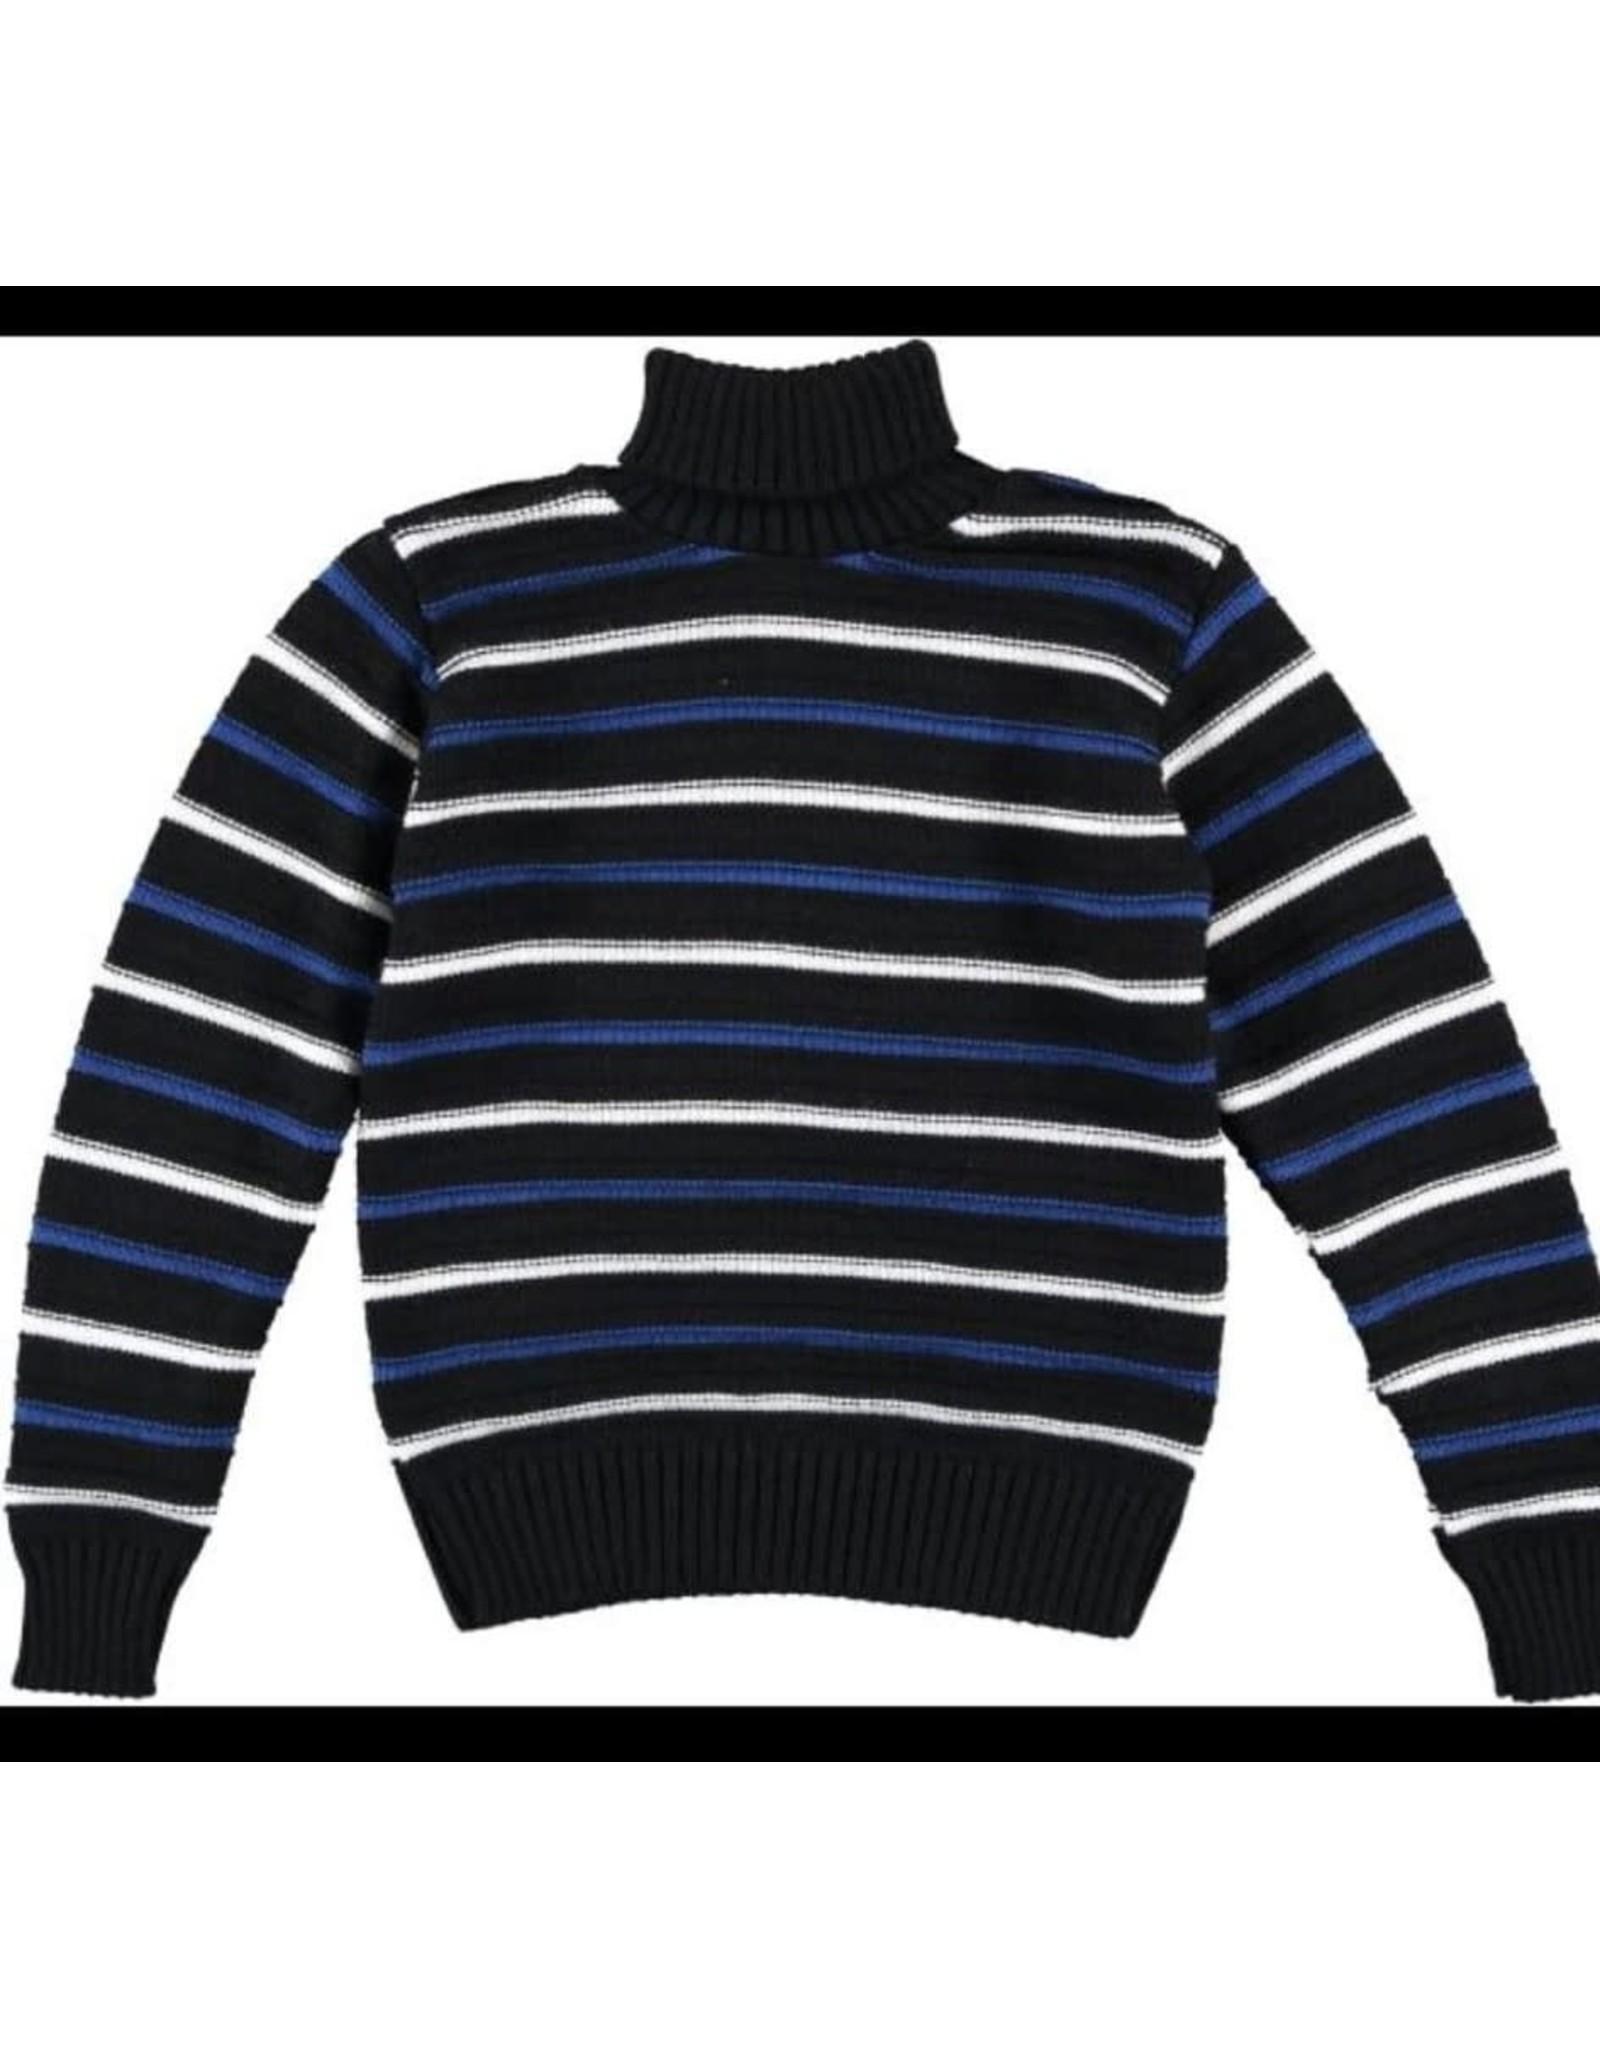 Manuell & frank Trui gebreid met strepen wit / blauw